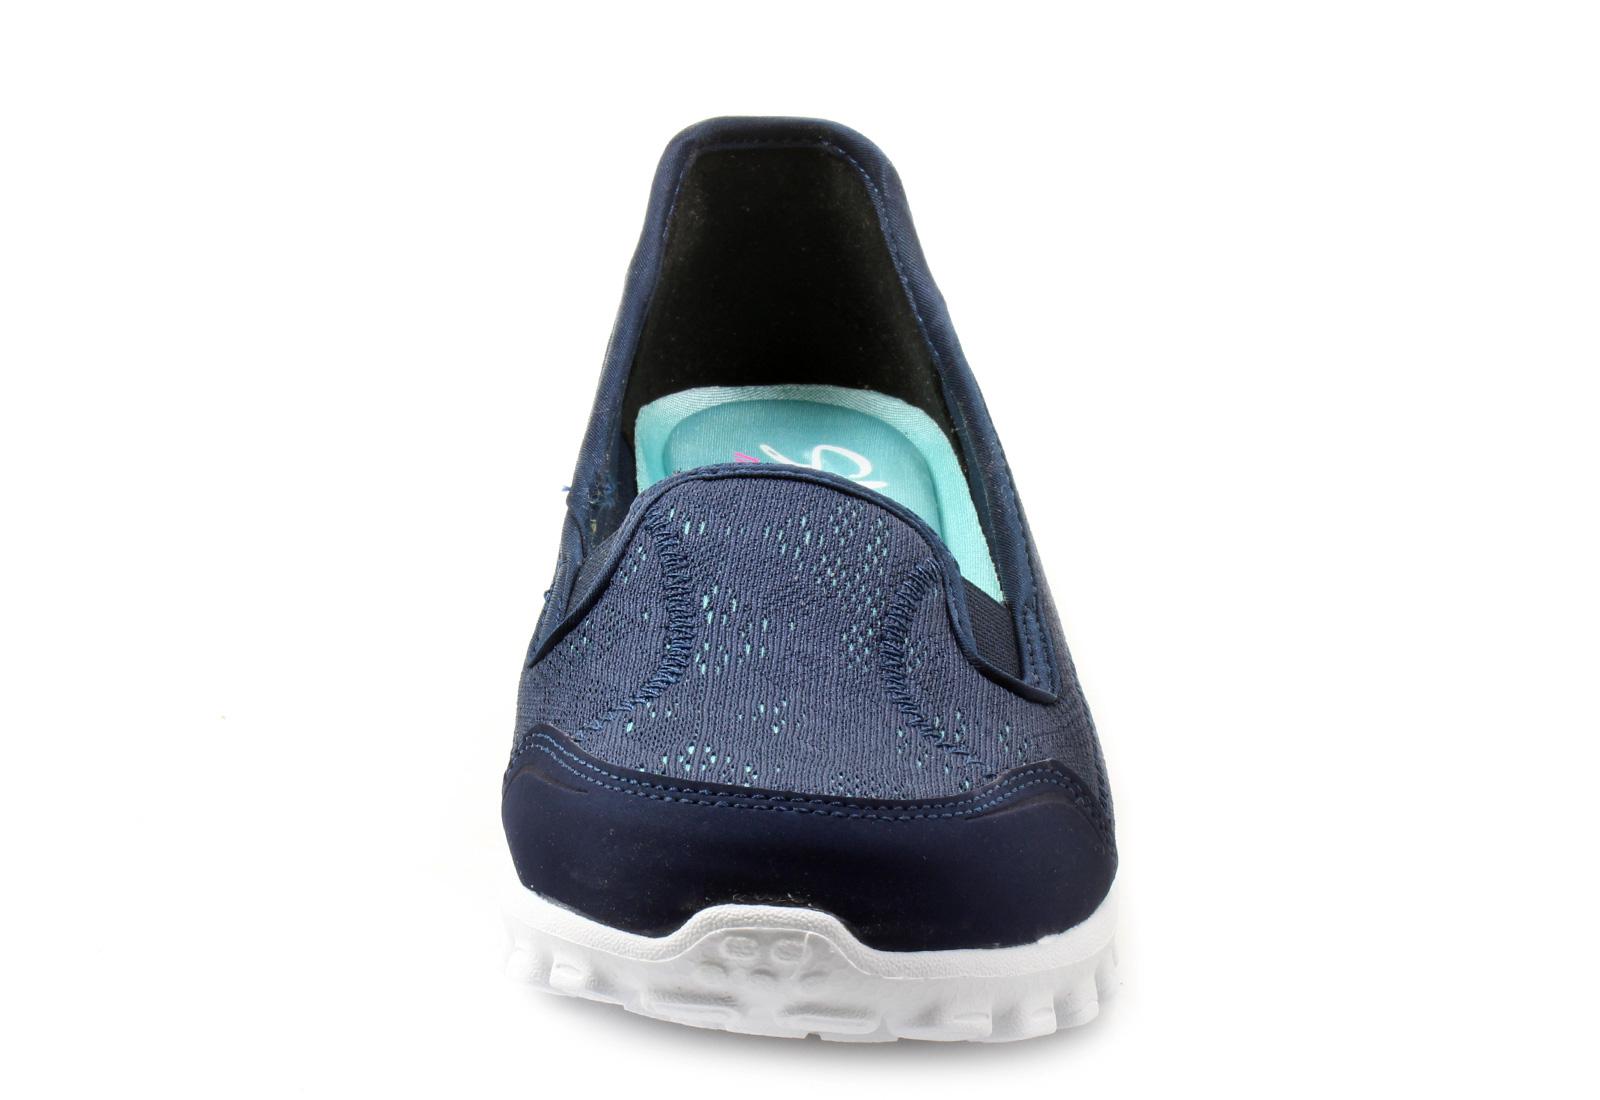 Dardos factor Frustración  Skechers Slip-on - This Kiss - 22667-NVAQ - Office Shoes Magyarország